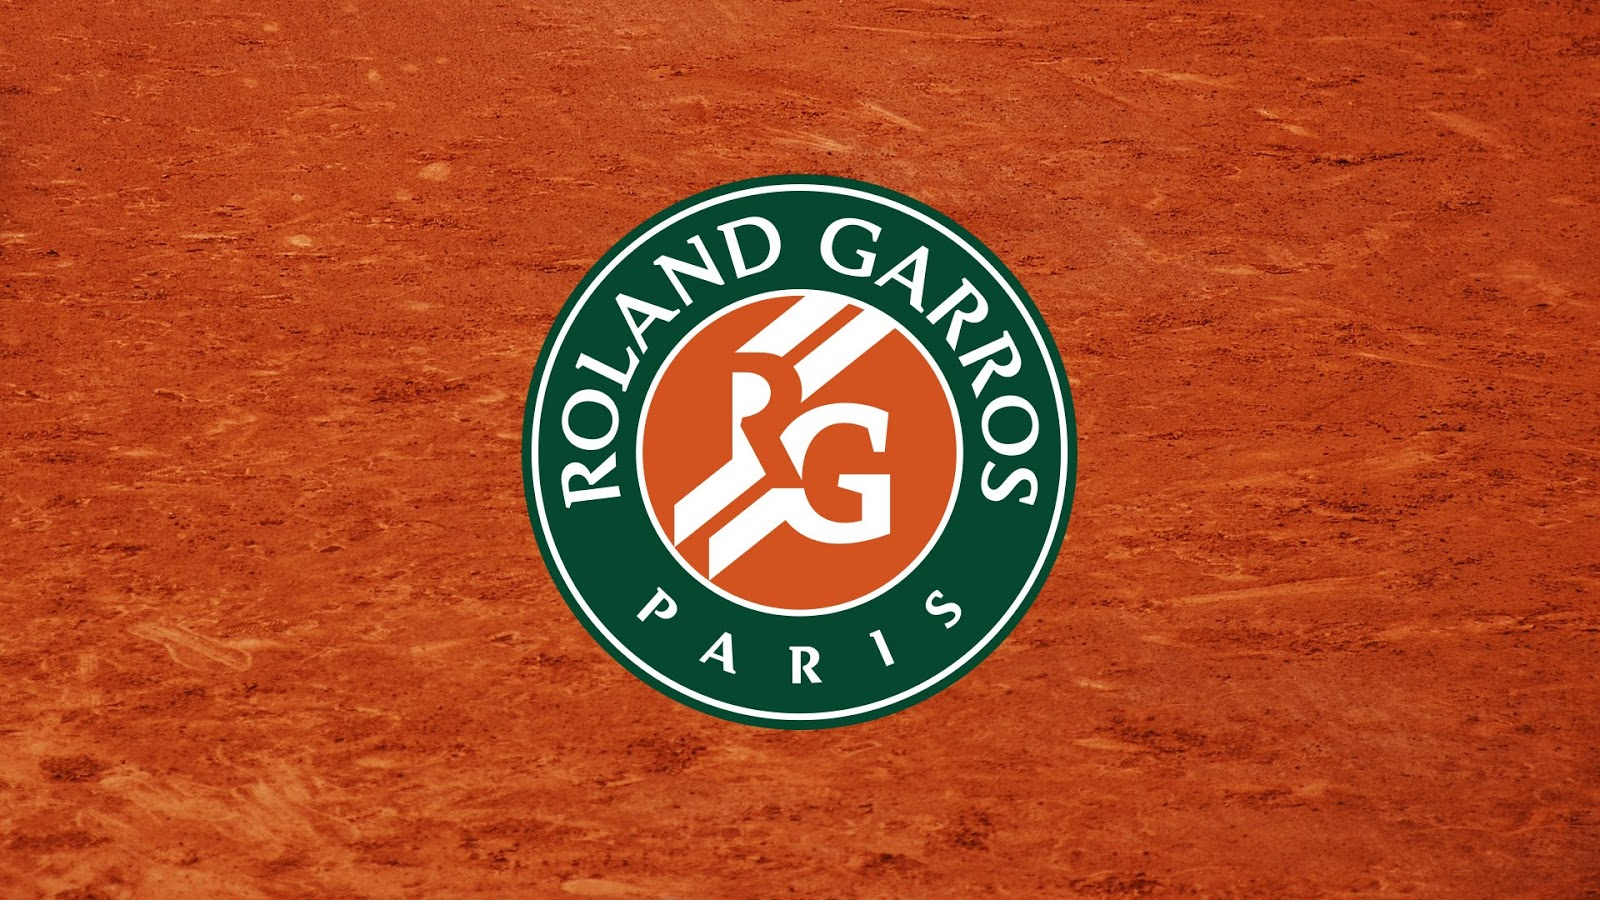 Rafael Nadal begins pursuit of 10th title against Benoit Paire